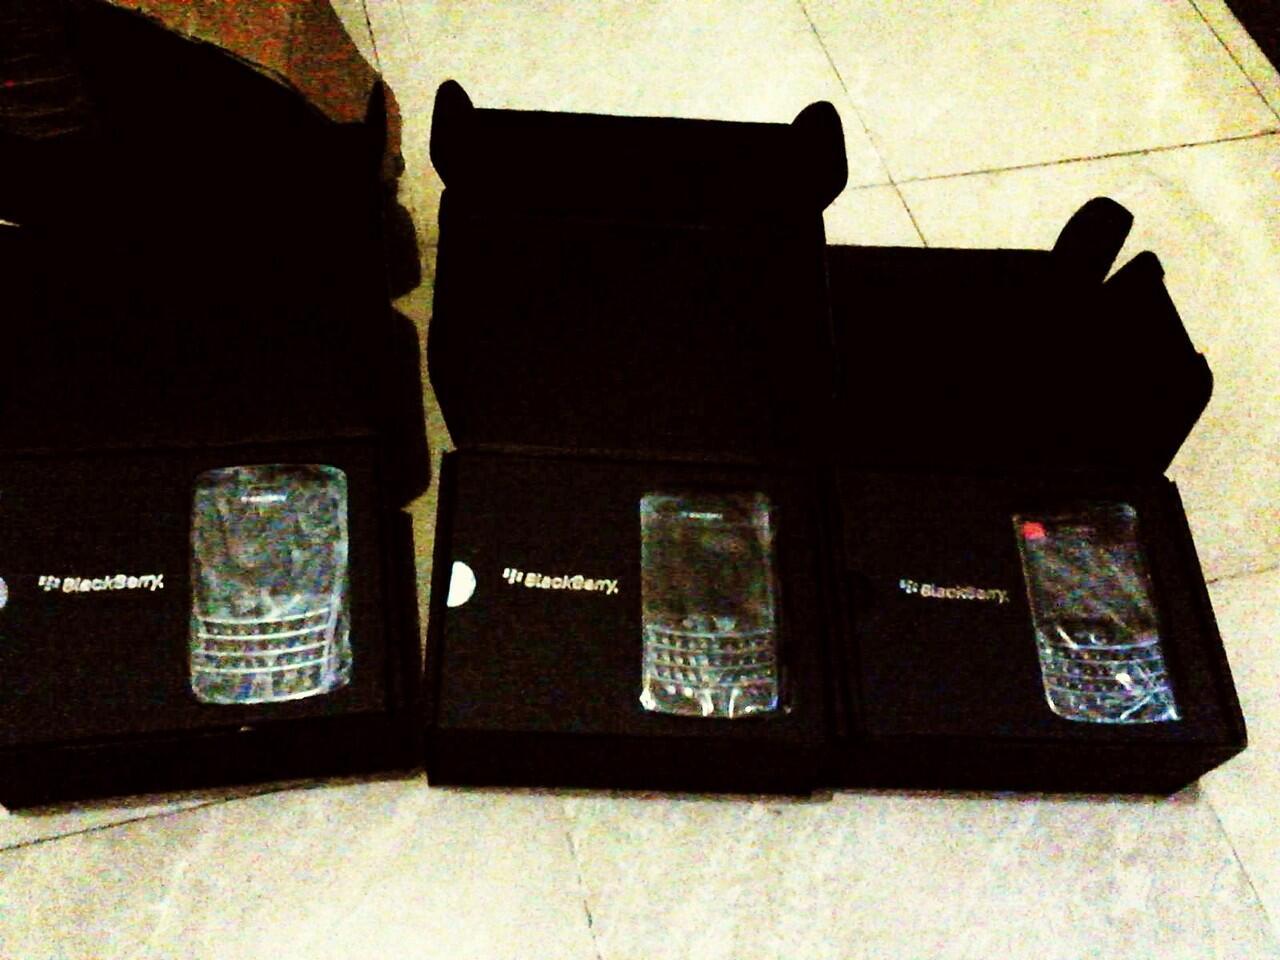 New Blackberry BB Tour1 9630 = 900ribuan (bisa COD)